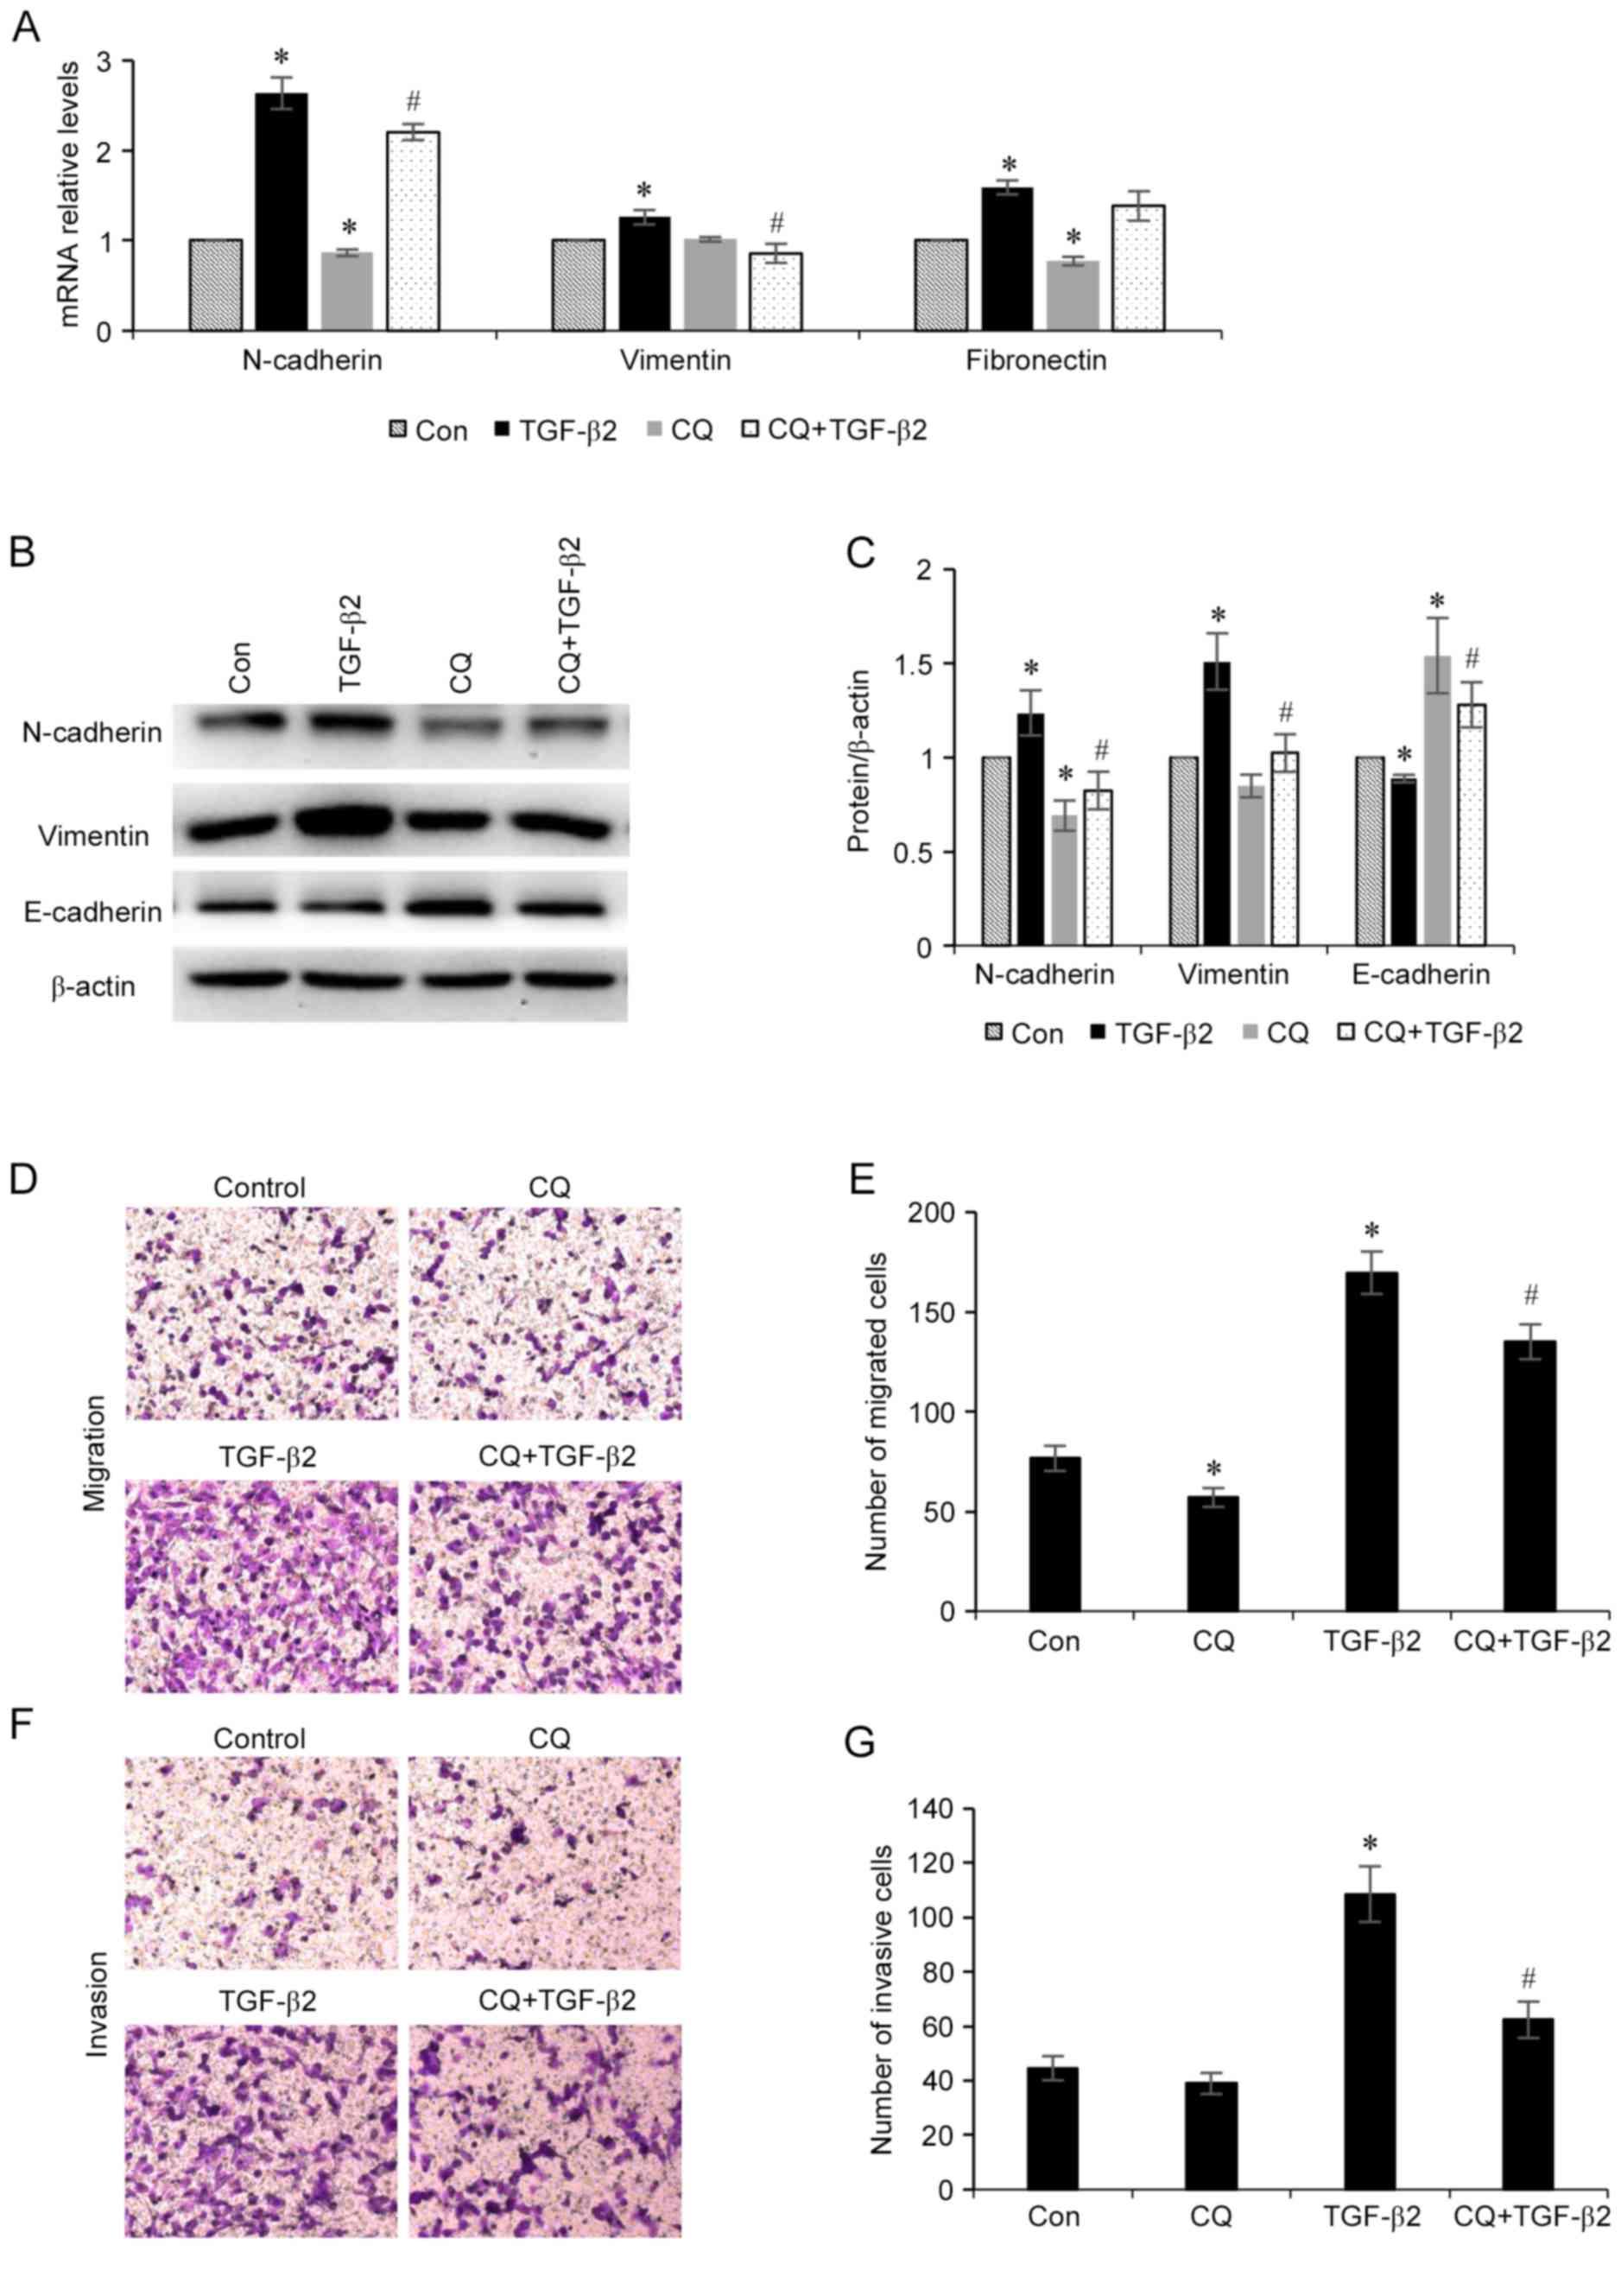 Autophagy regulates TGF-β2-induced epithelial-mesenchymal